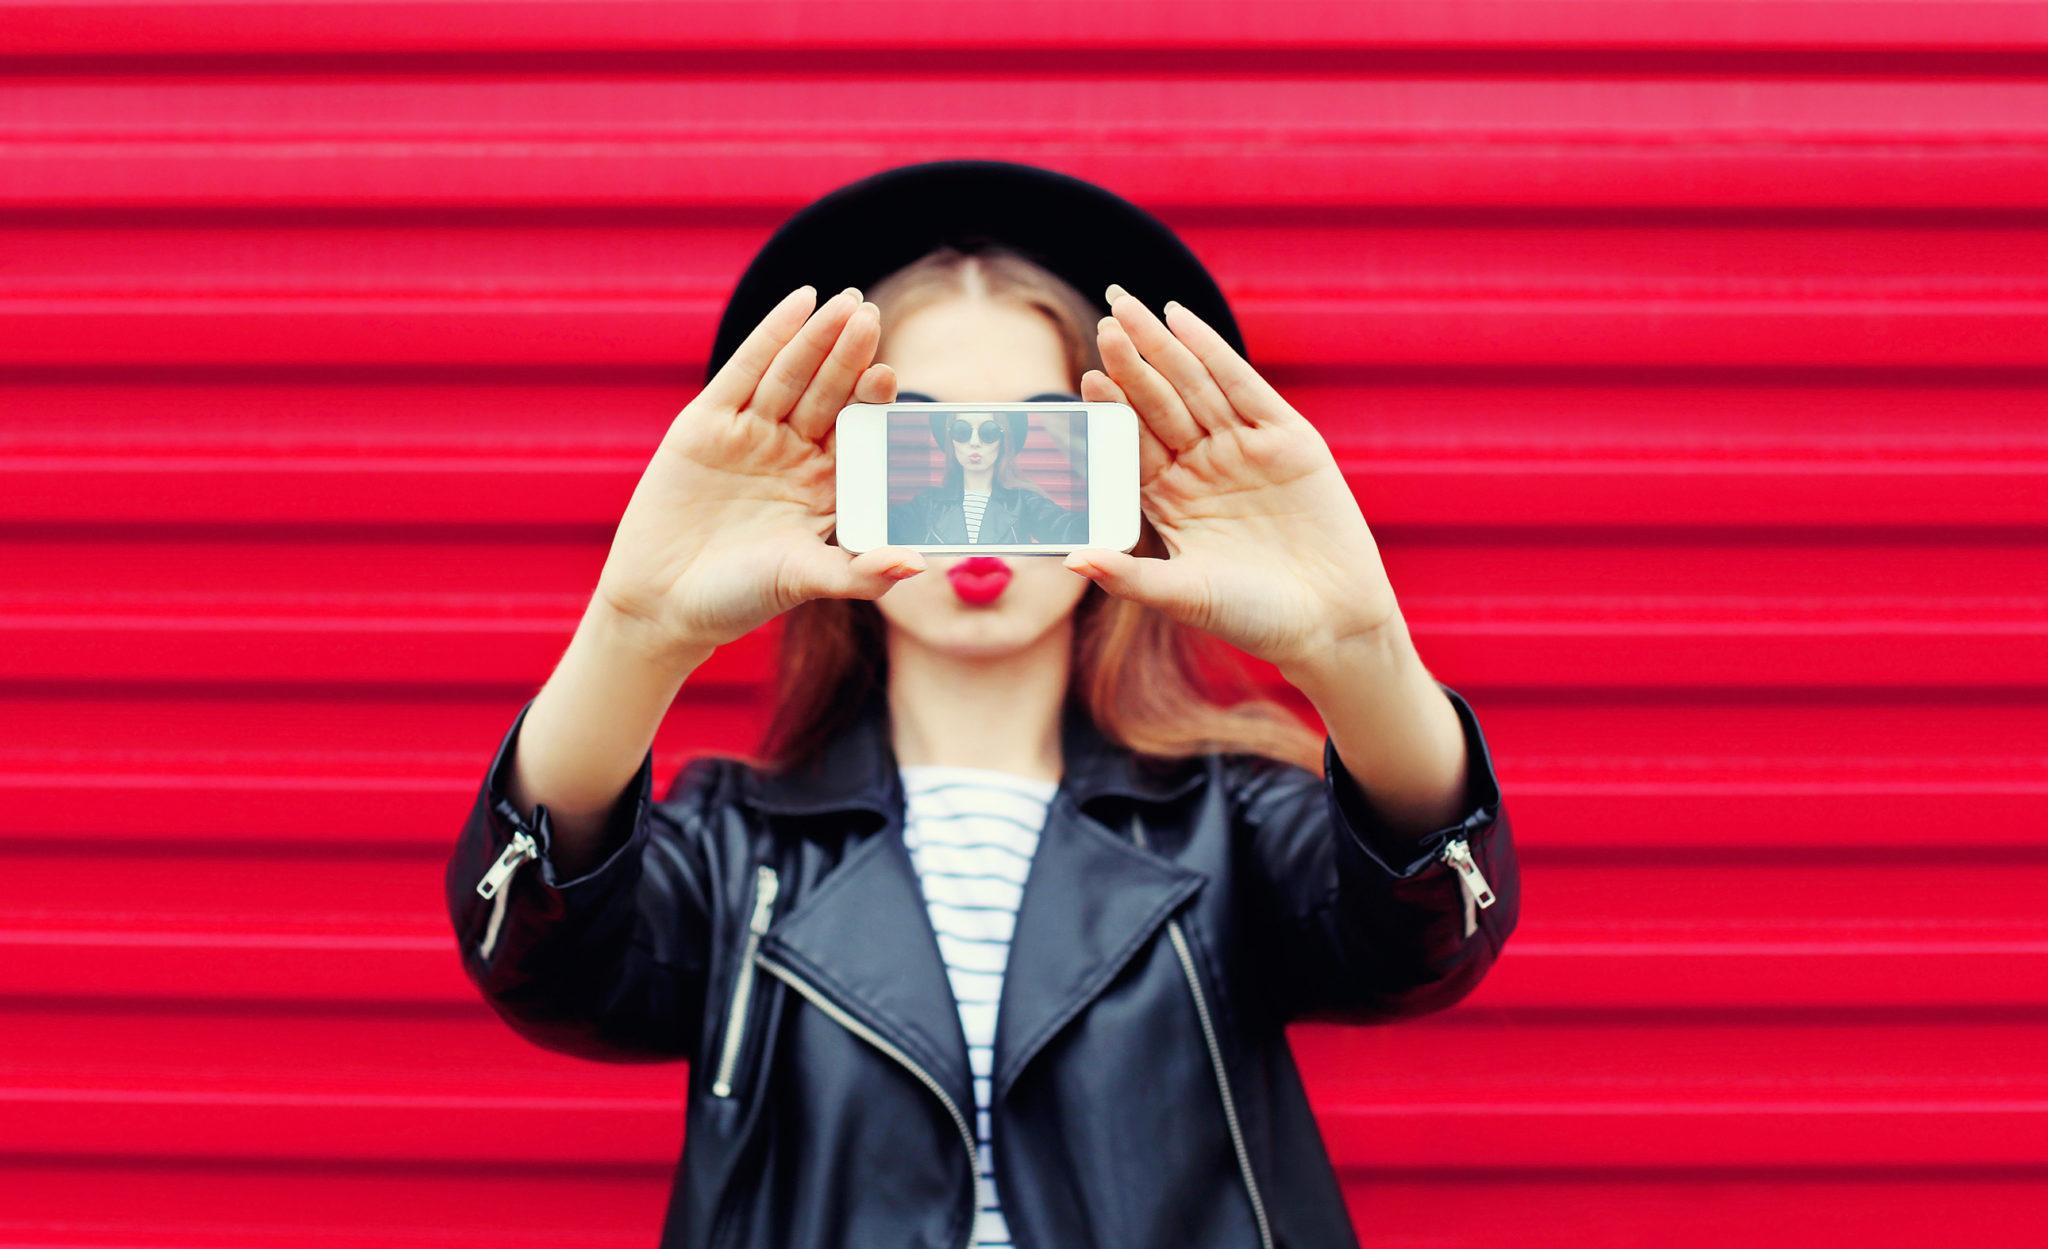 Legal Tips for Instagram Influencers